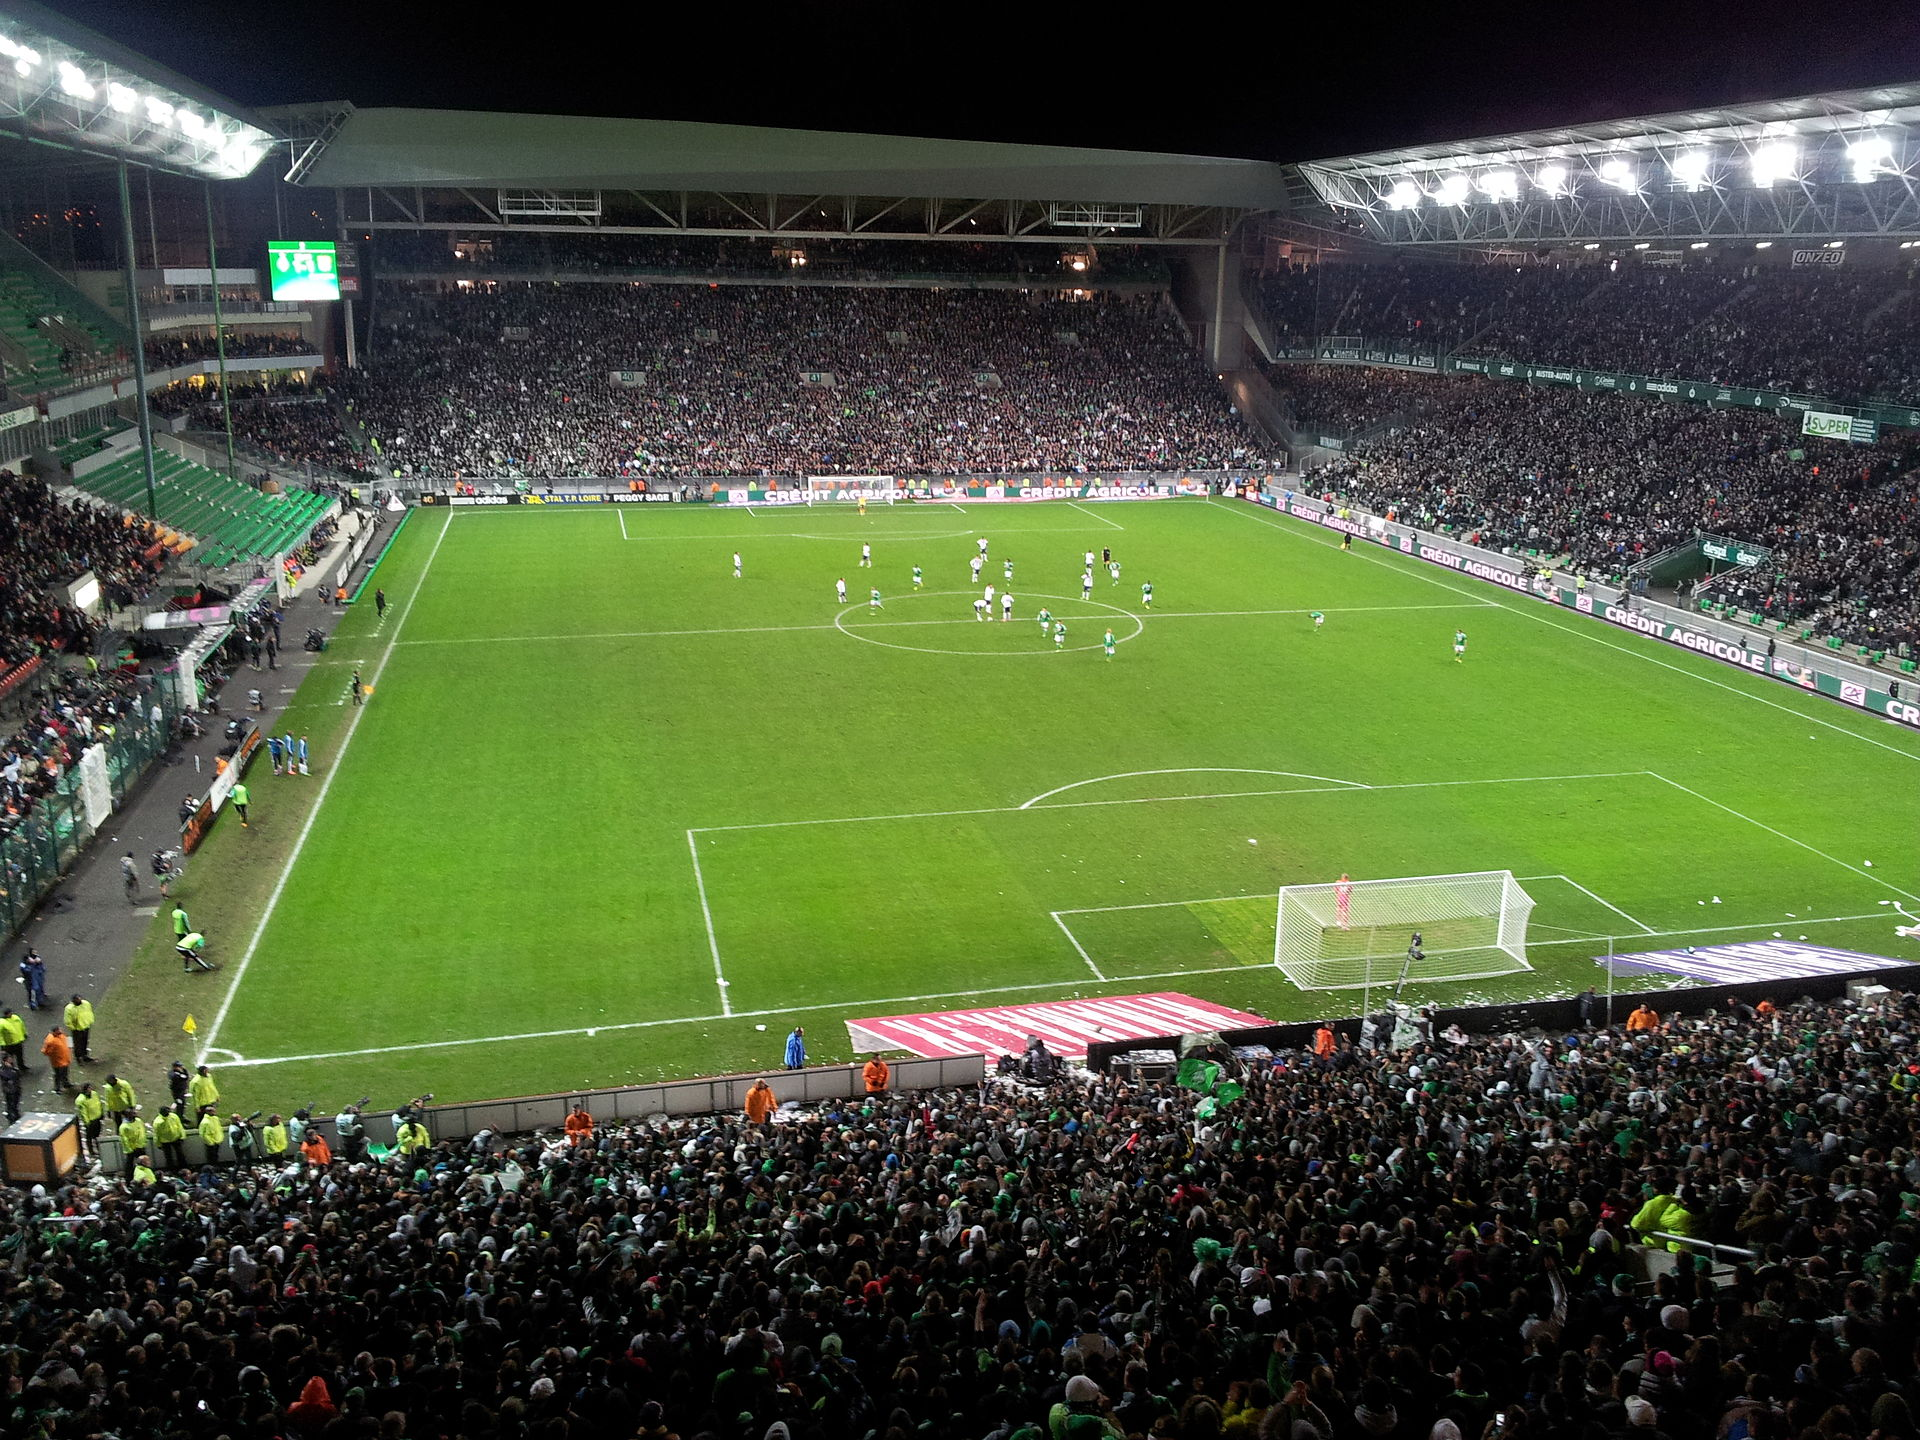 Stade Geoffroy-Guichard 2